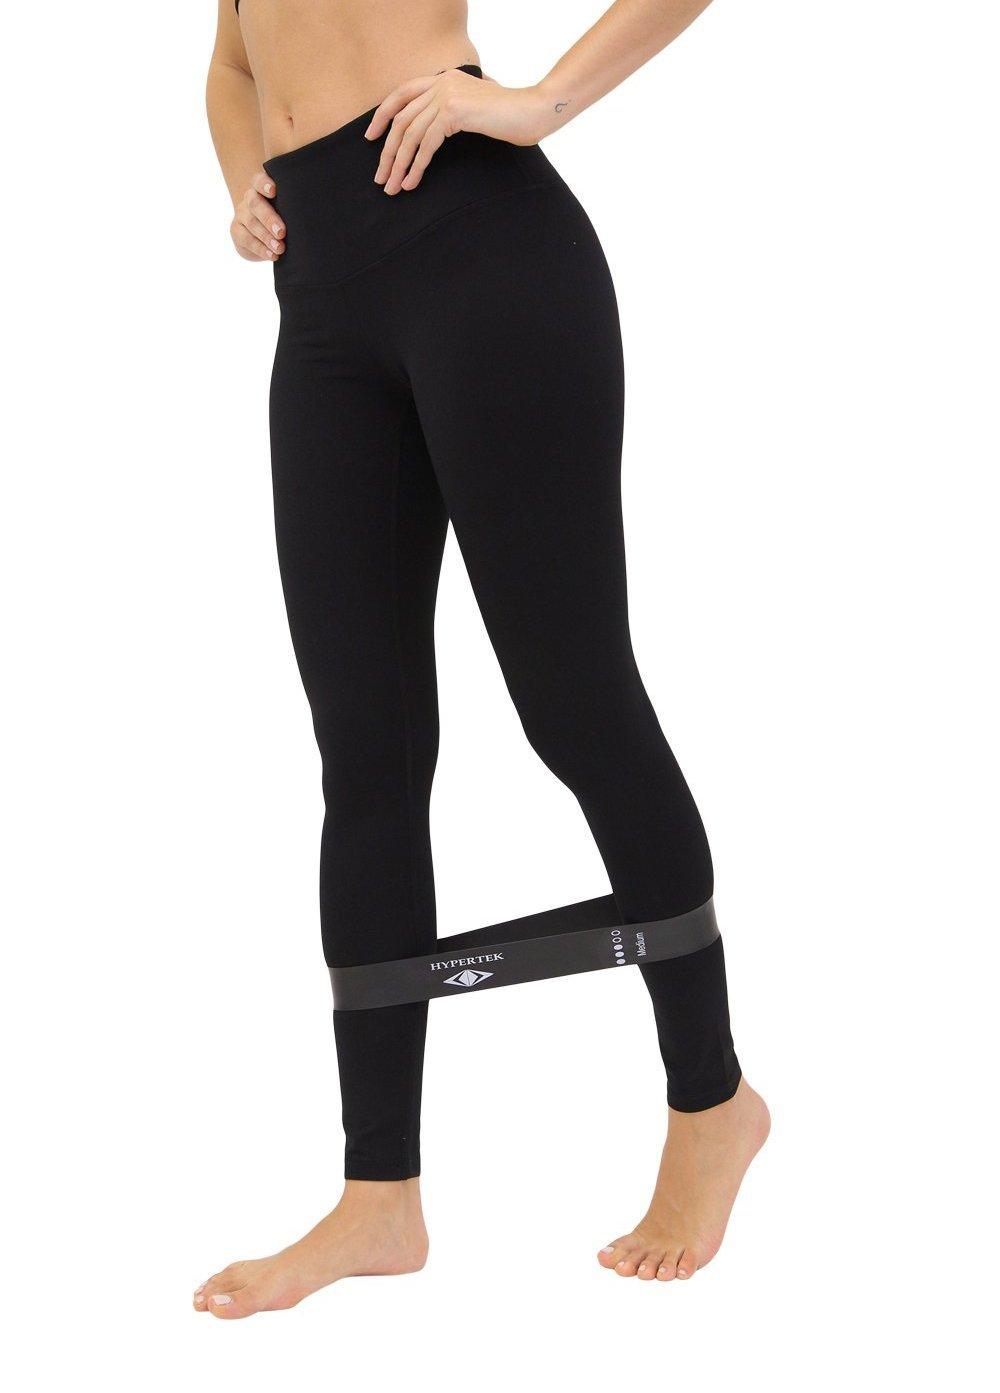 90 degree by reflex black legging